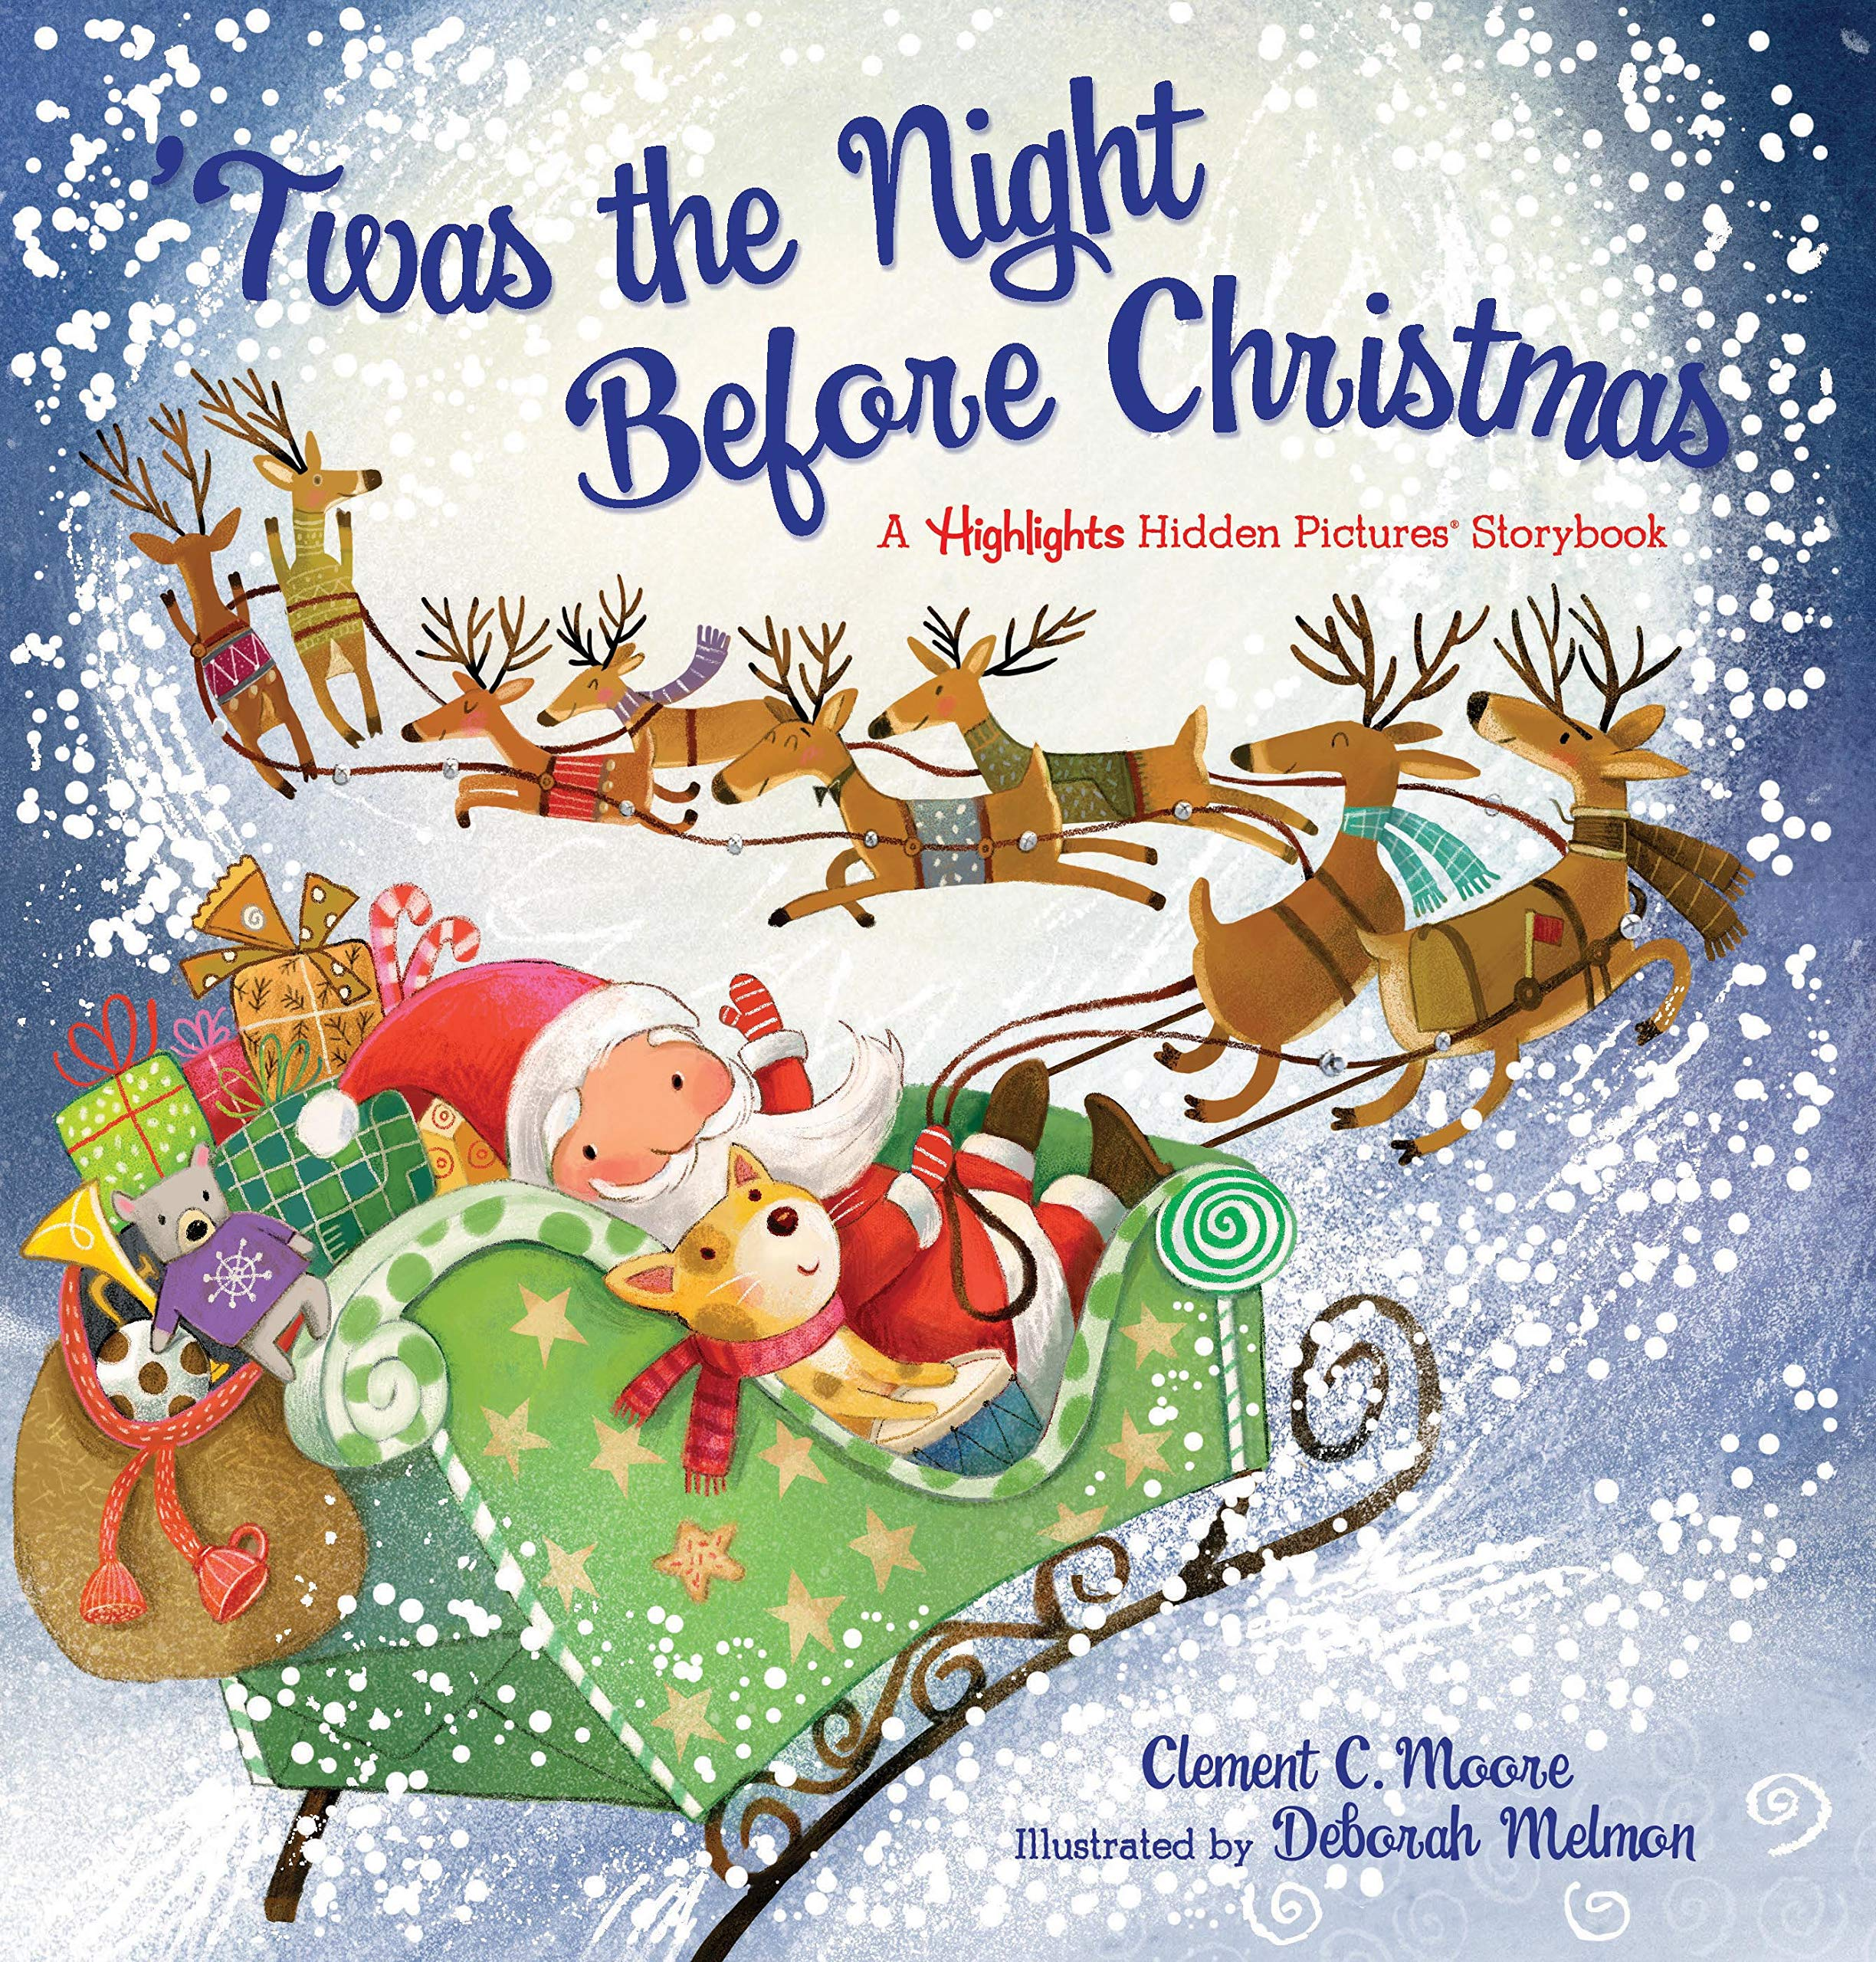 The Night Before Christmas Book Christmas Shelf Elf accessories